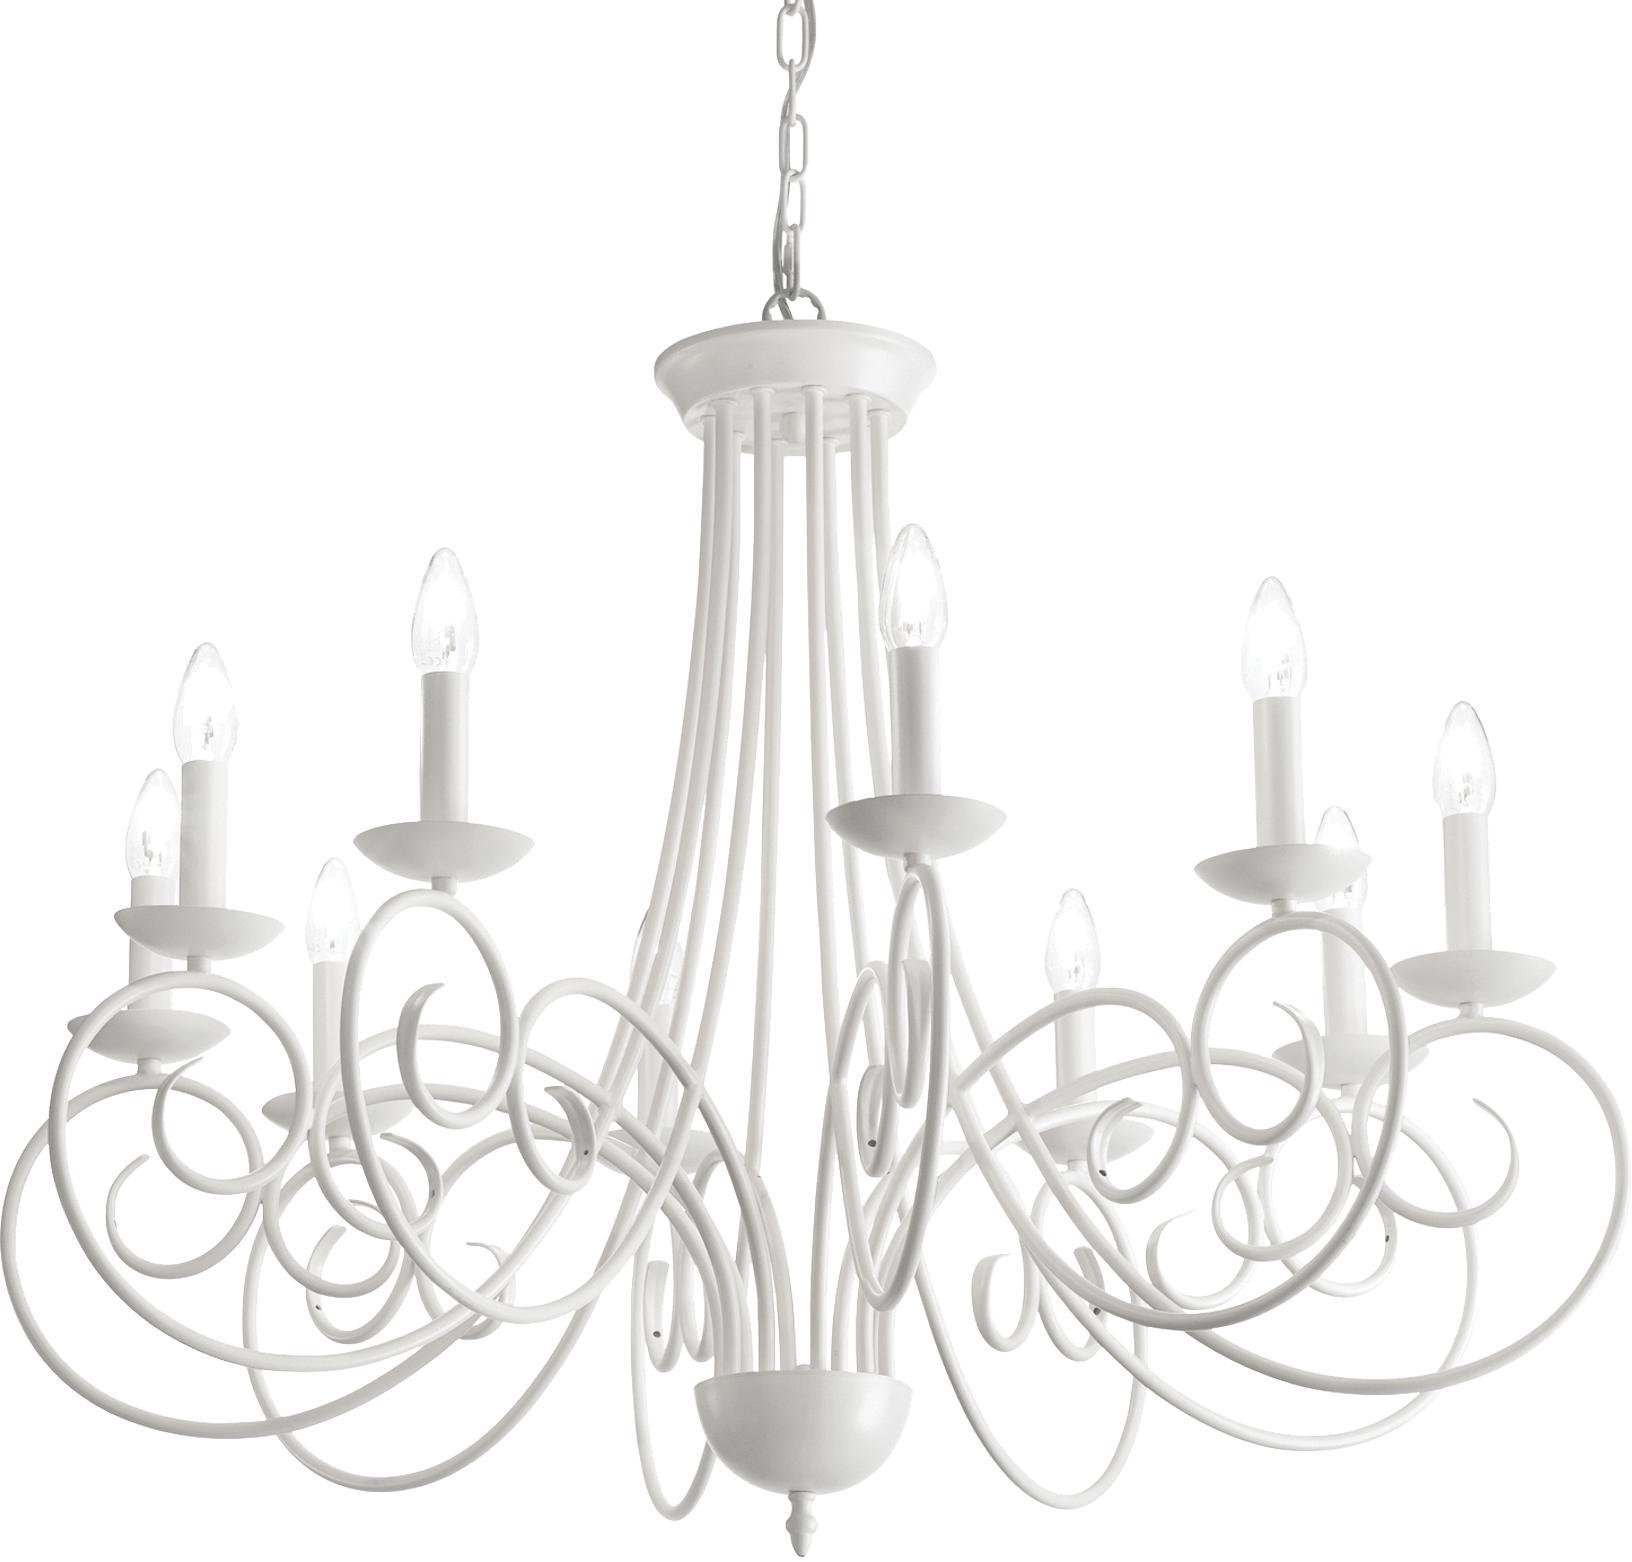 Ideal lux LED Sem Kronleuchter 10x5W 100432